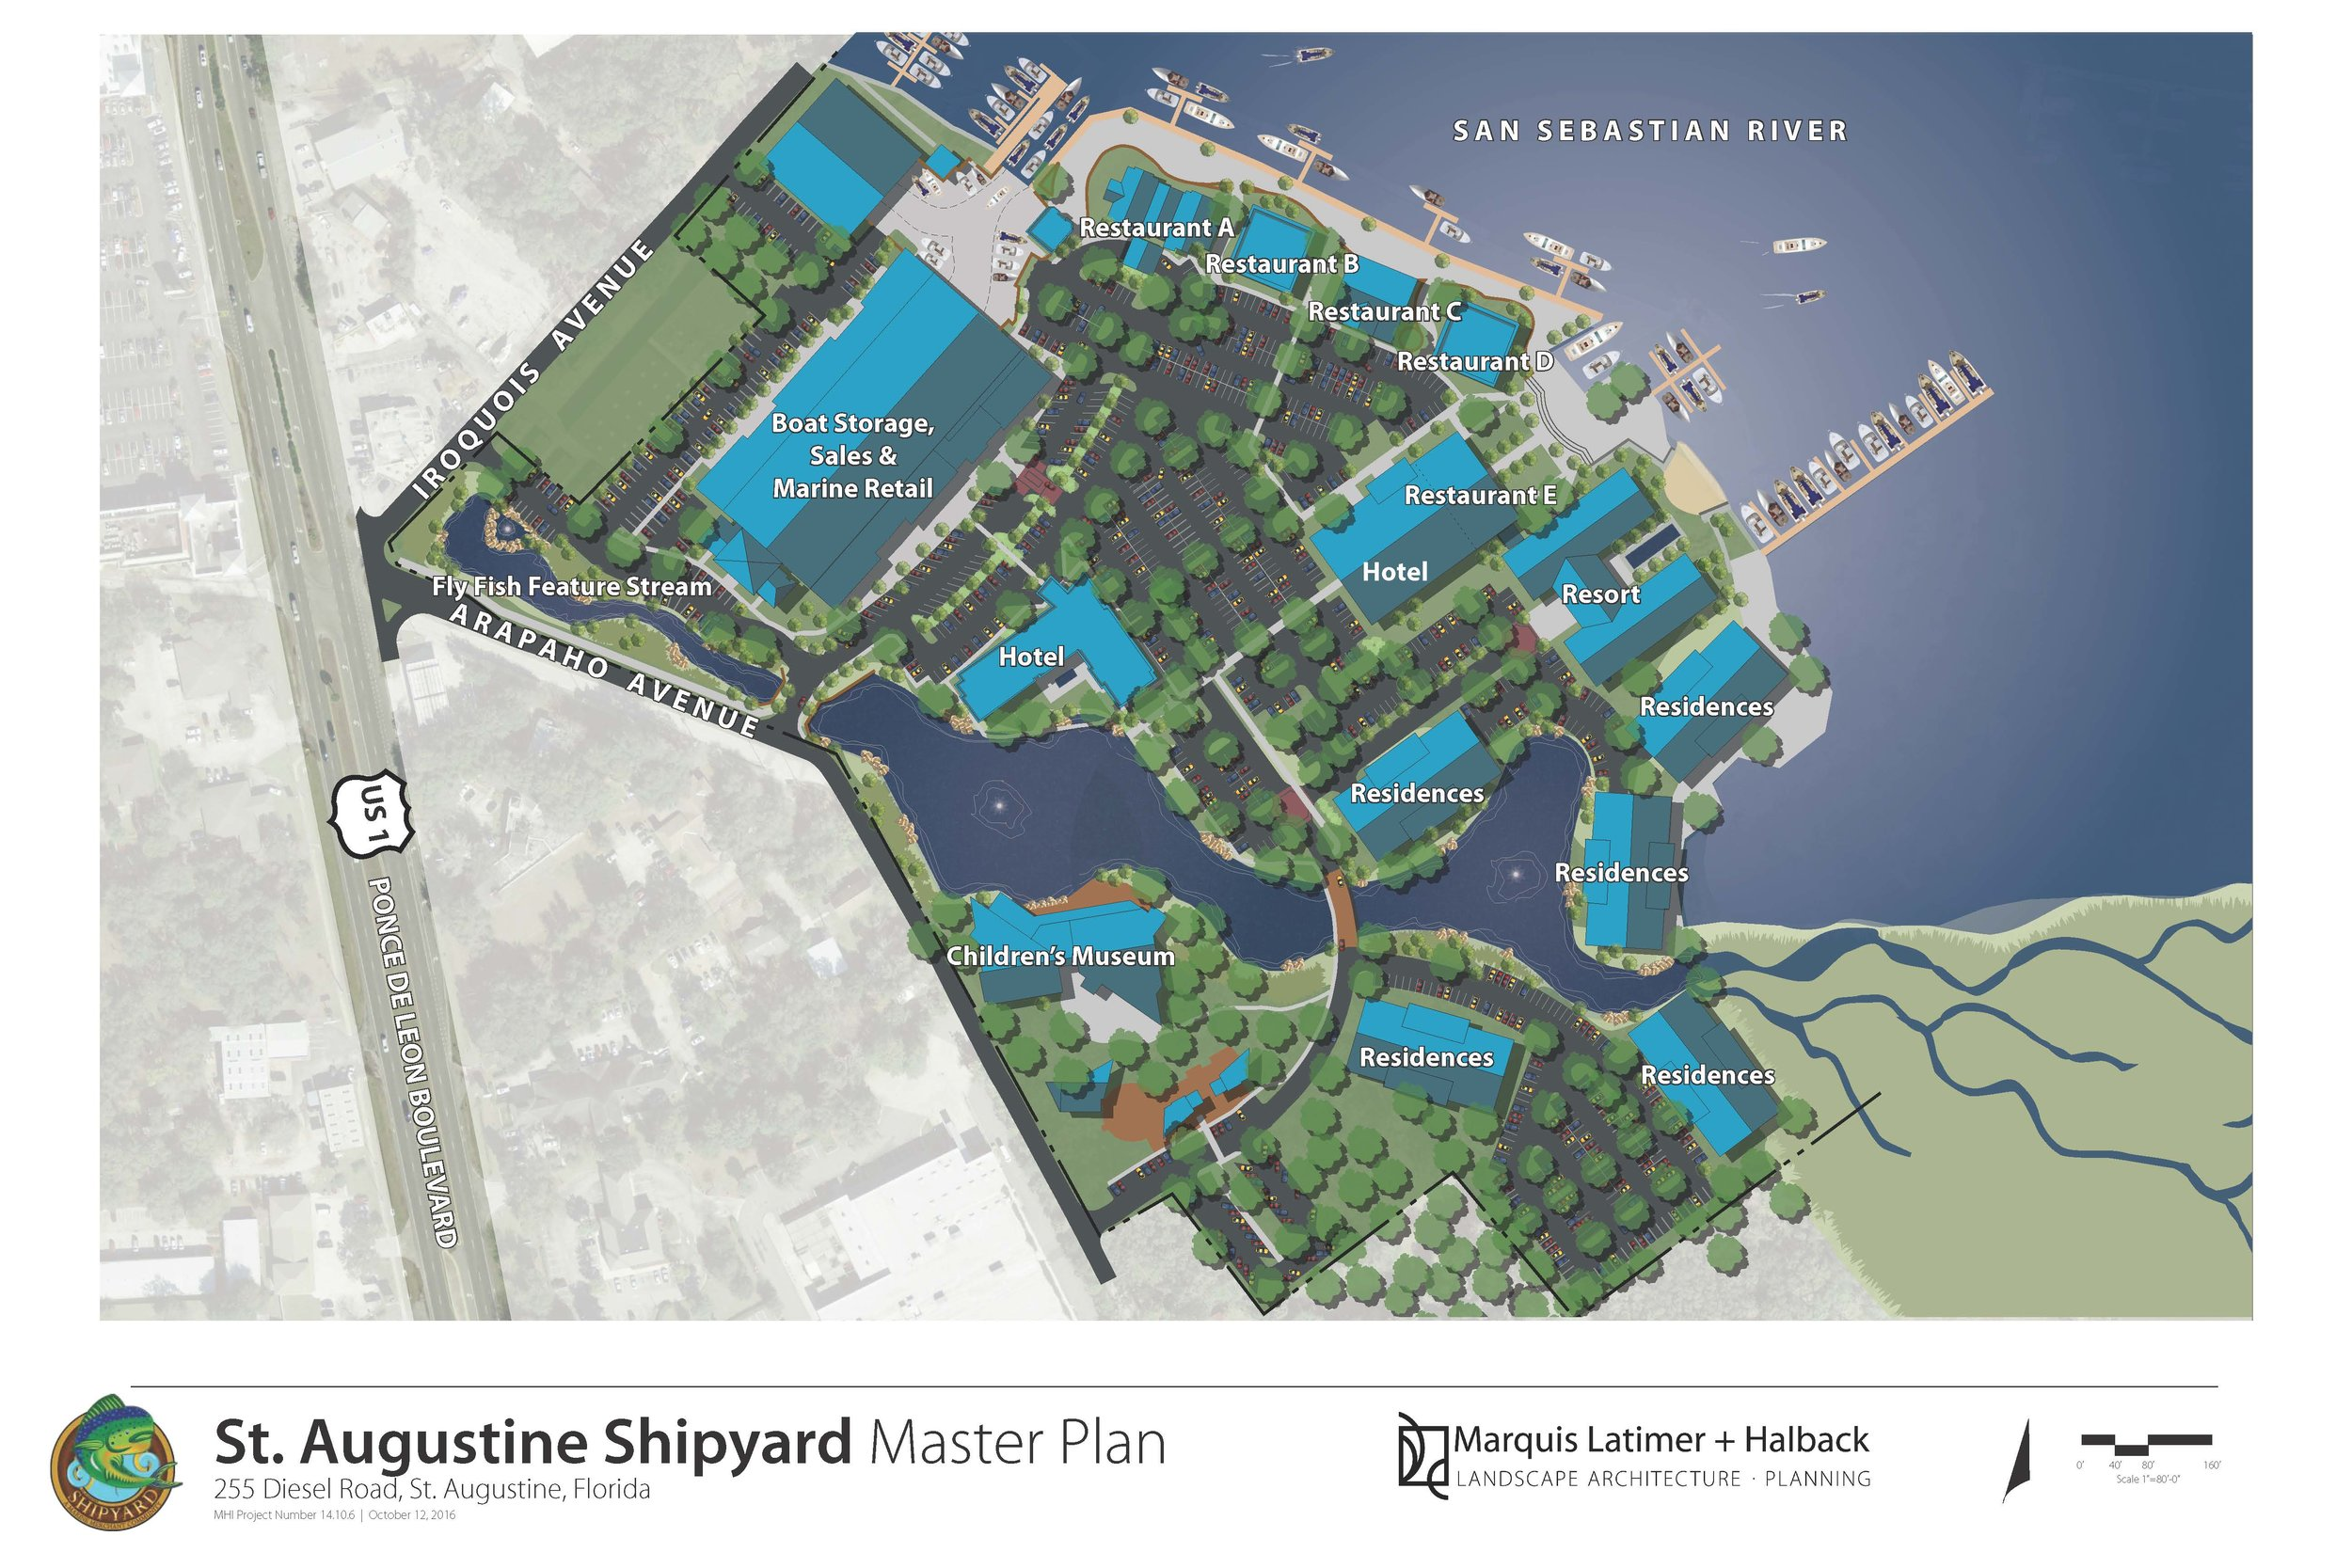 St. Augustine Shipyard Master Plan